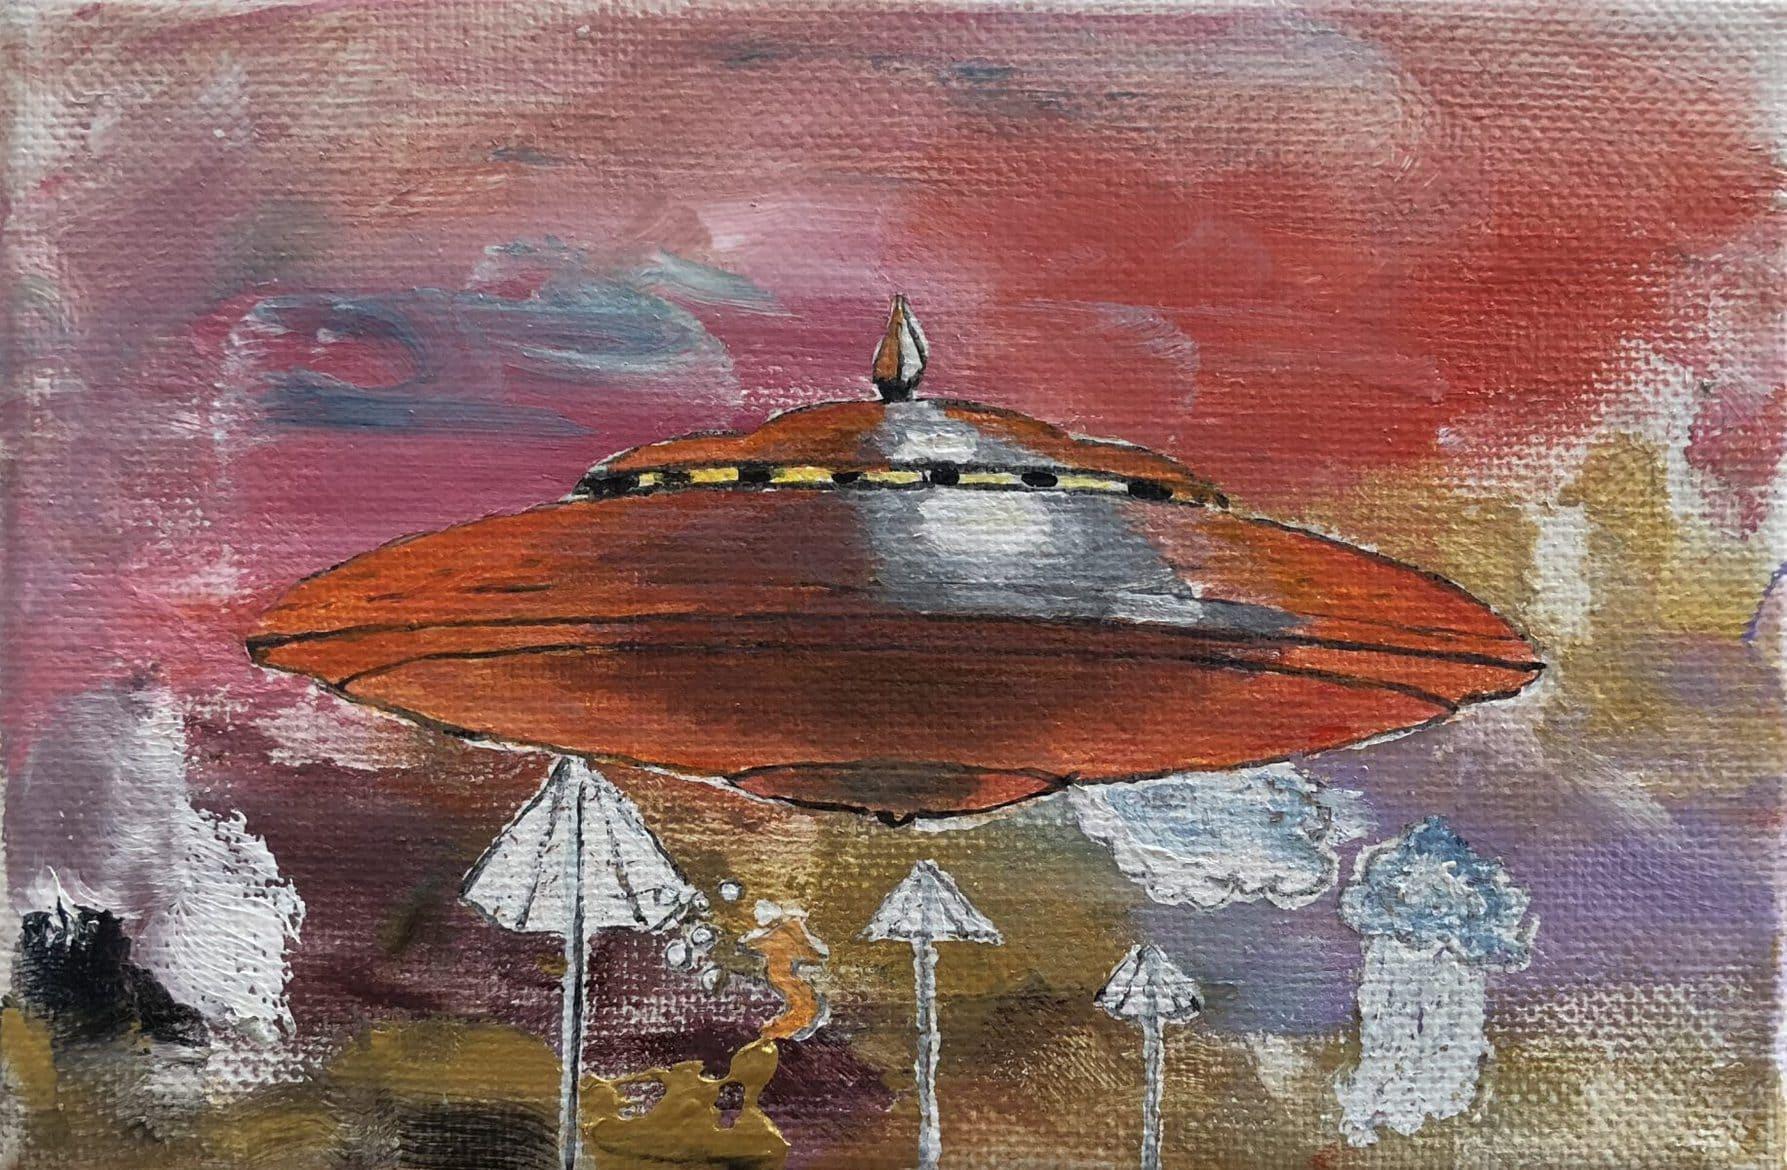 Tim Johnson, 'Red UFO', 2017, acrylic on canvas, 10 x 15 cm